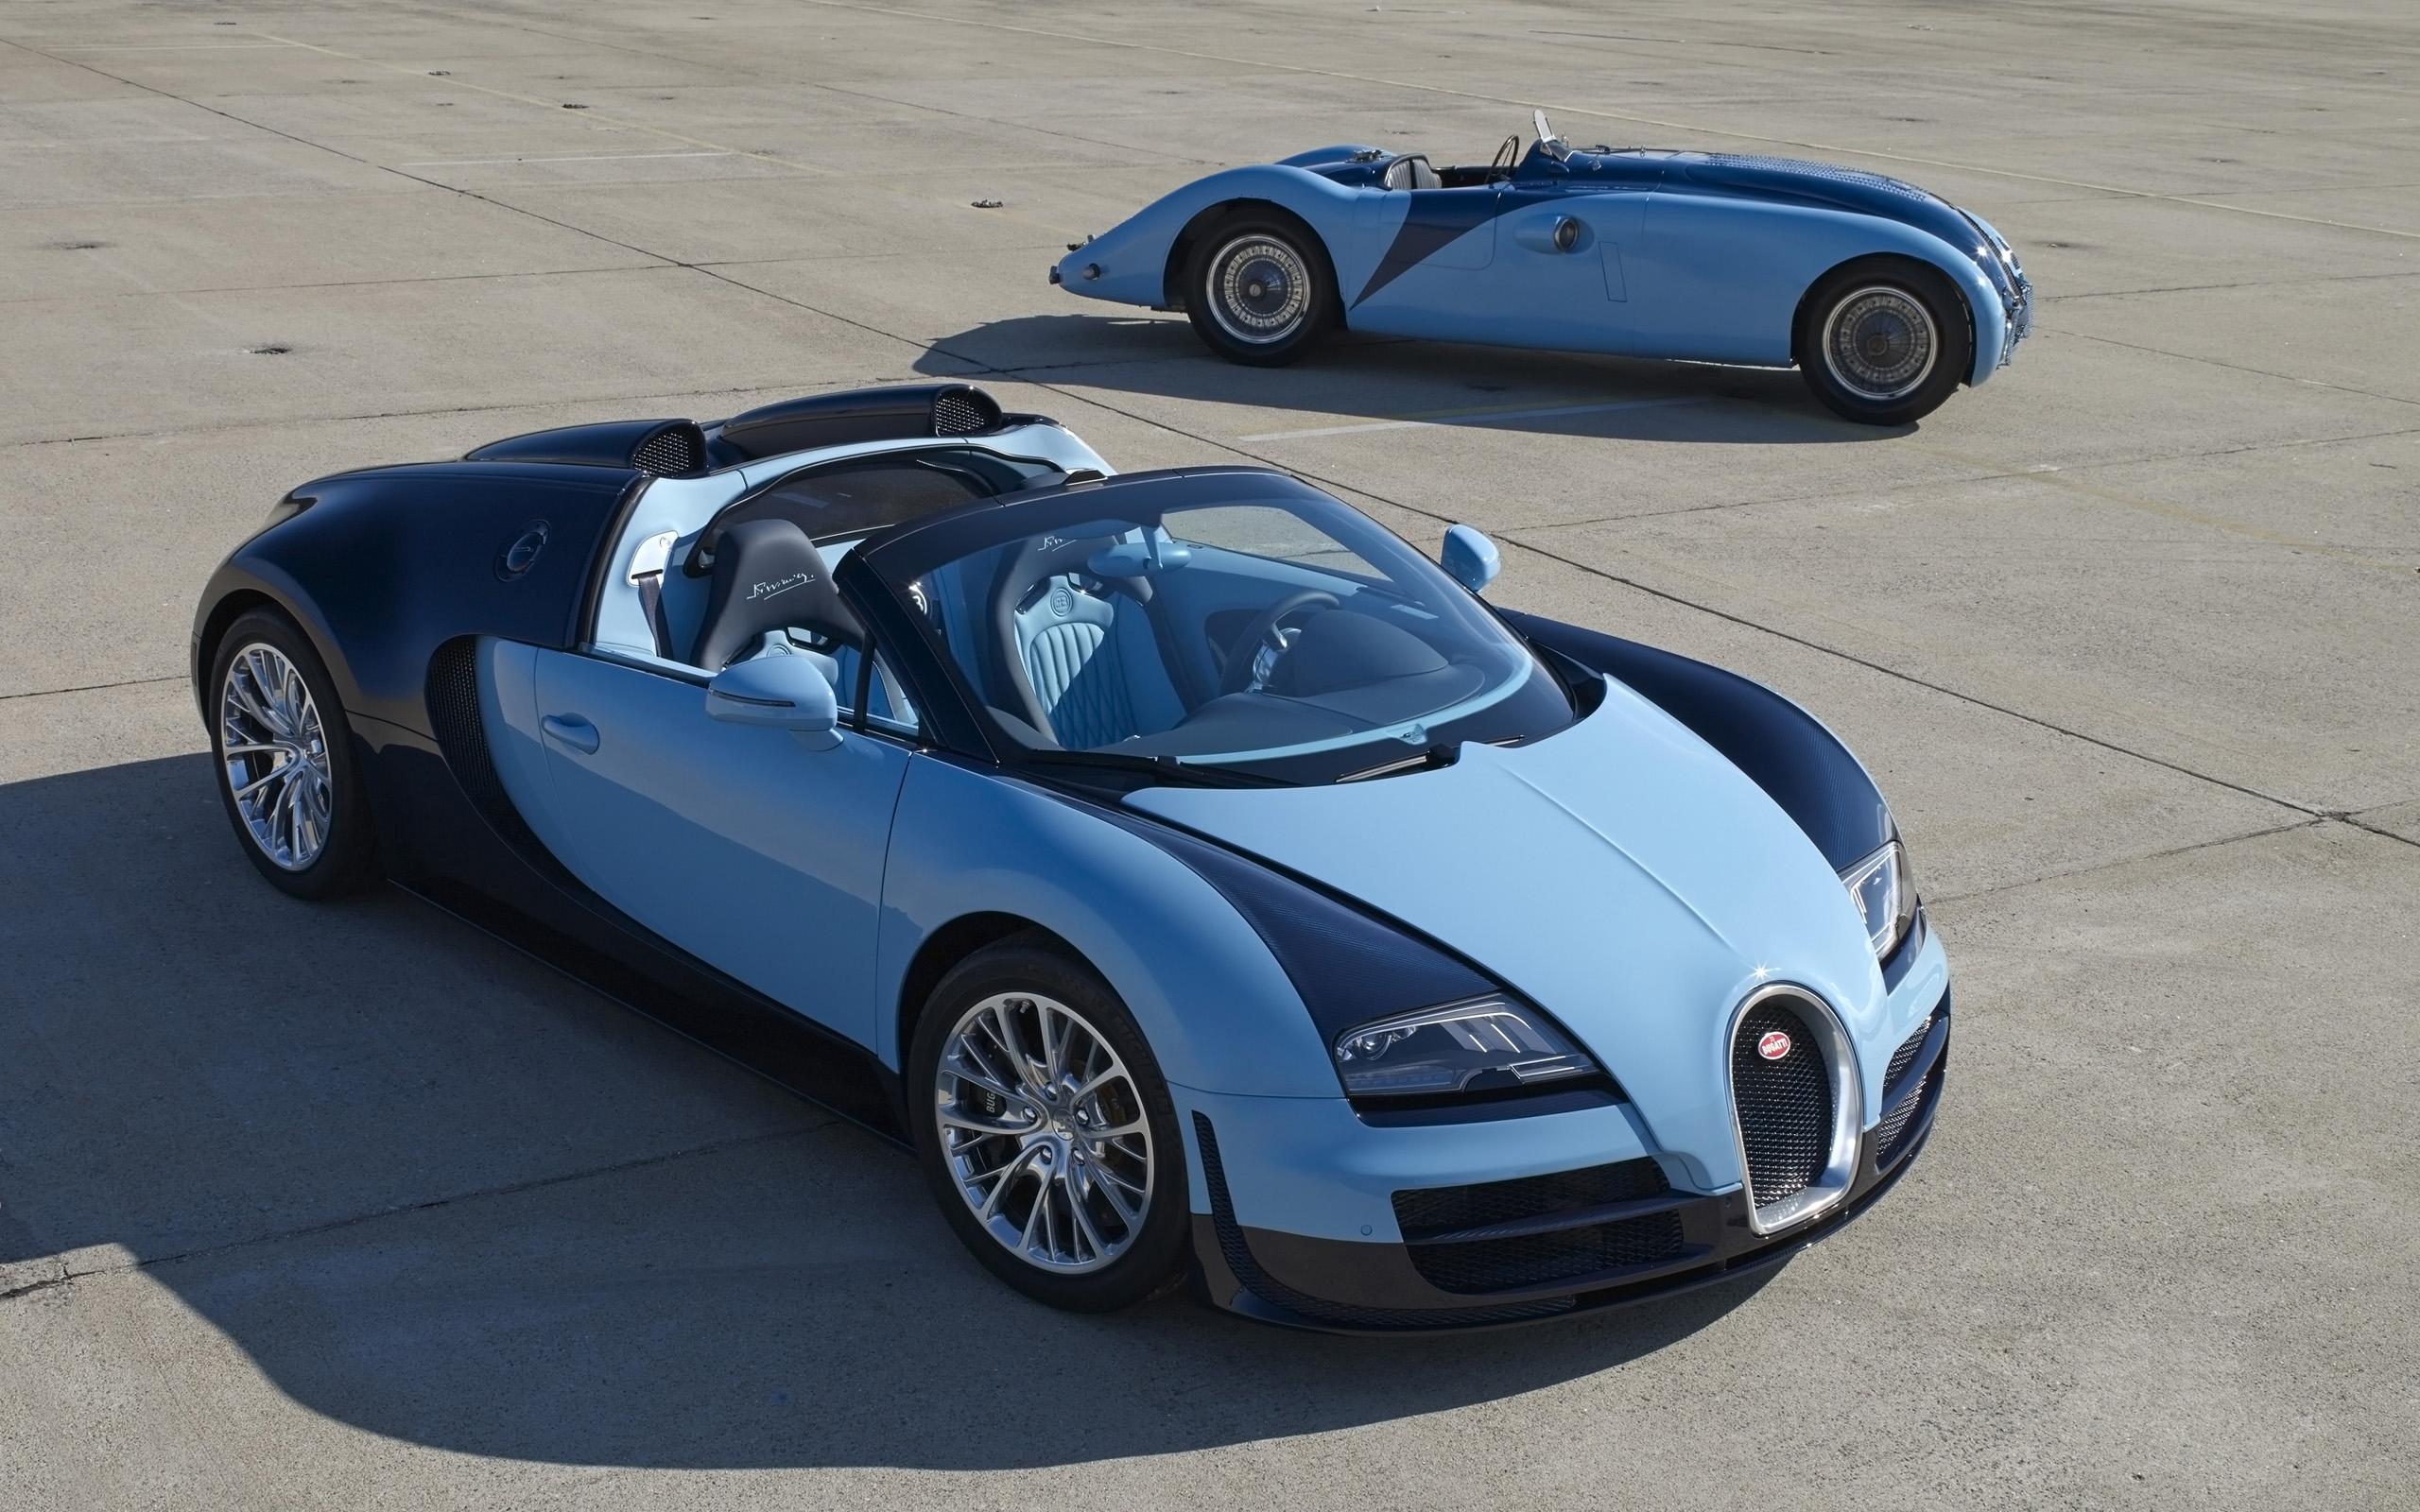 bugatti-veyron-grand-sport-vitesse-legend-jean-pierre-wimille-Bugatti-Veyro-wallpaper-wpc5803088